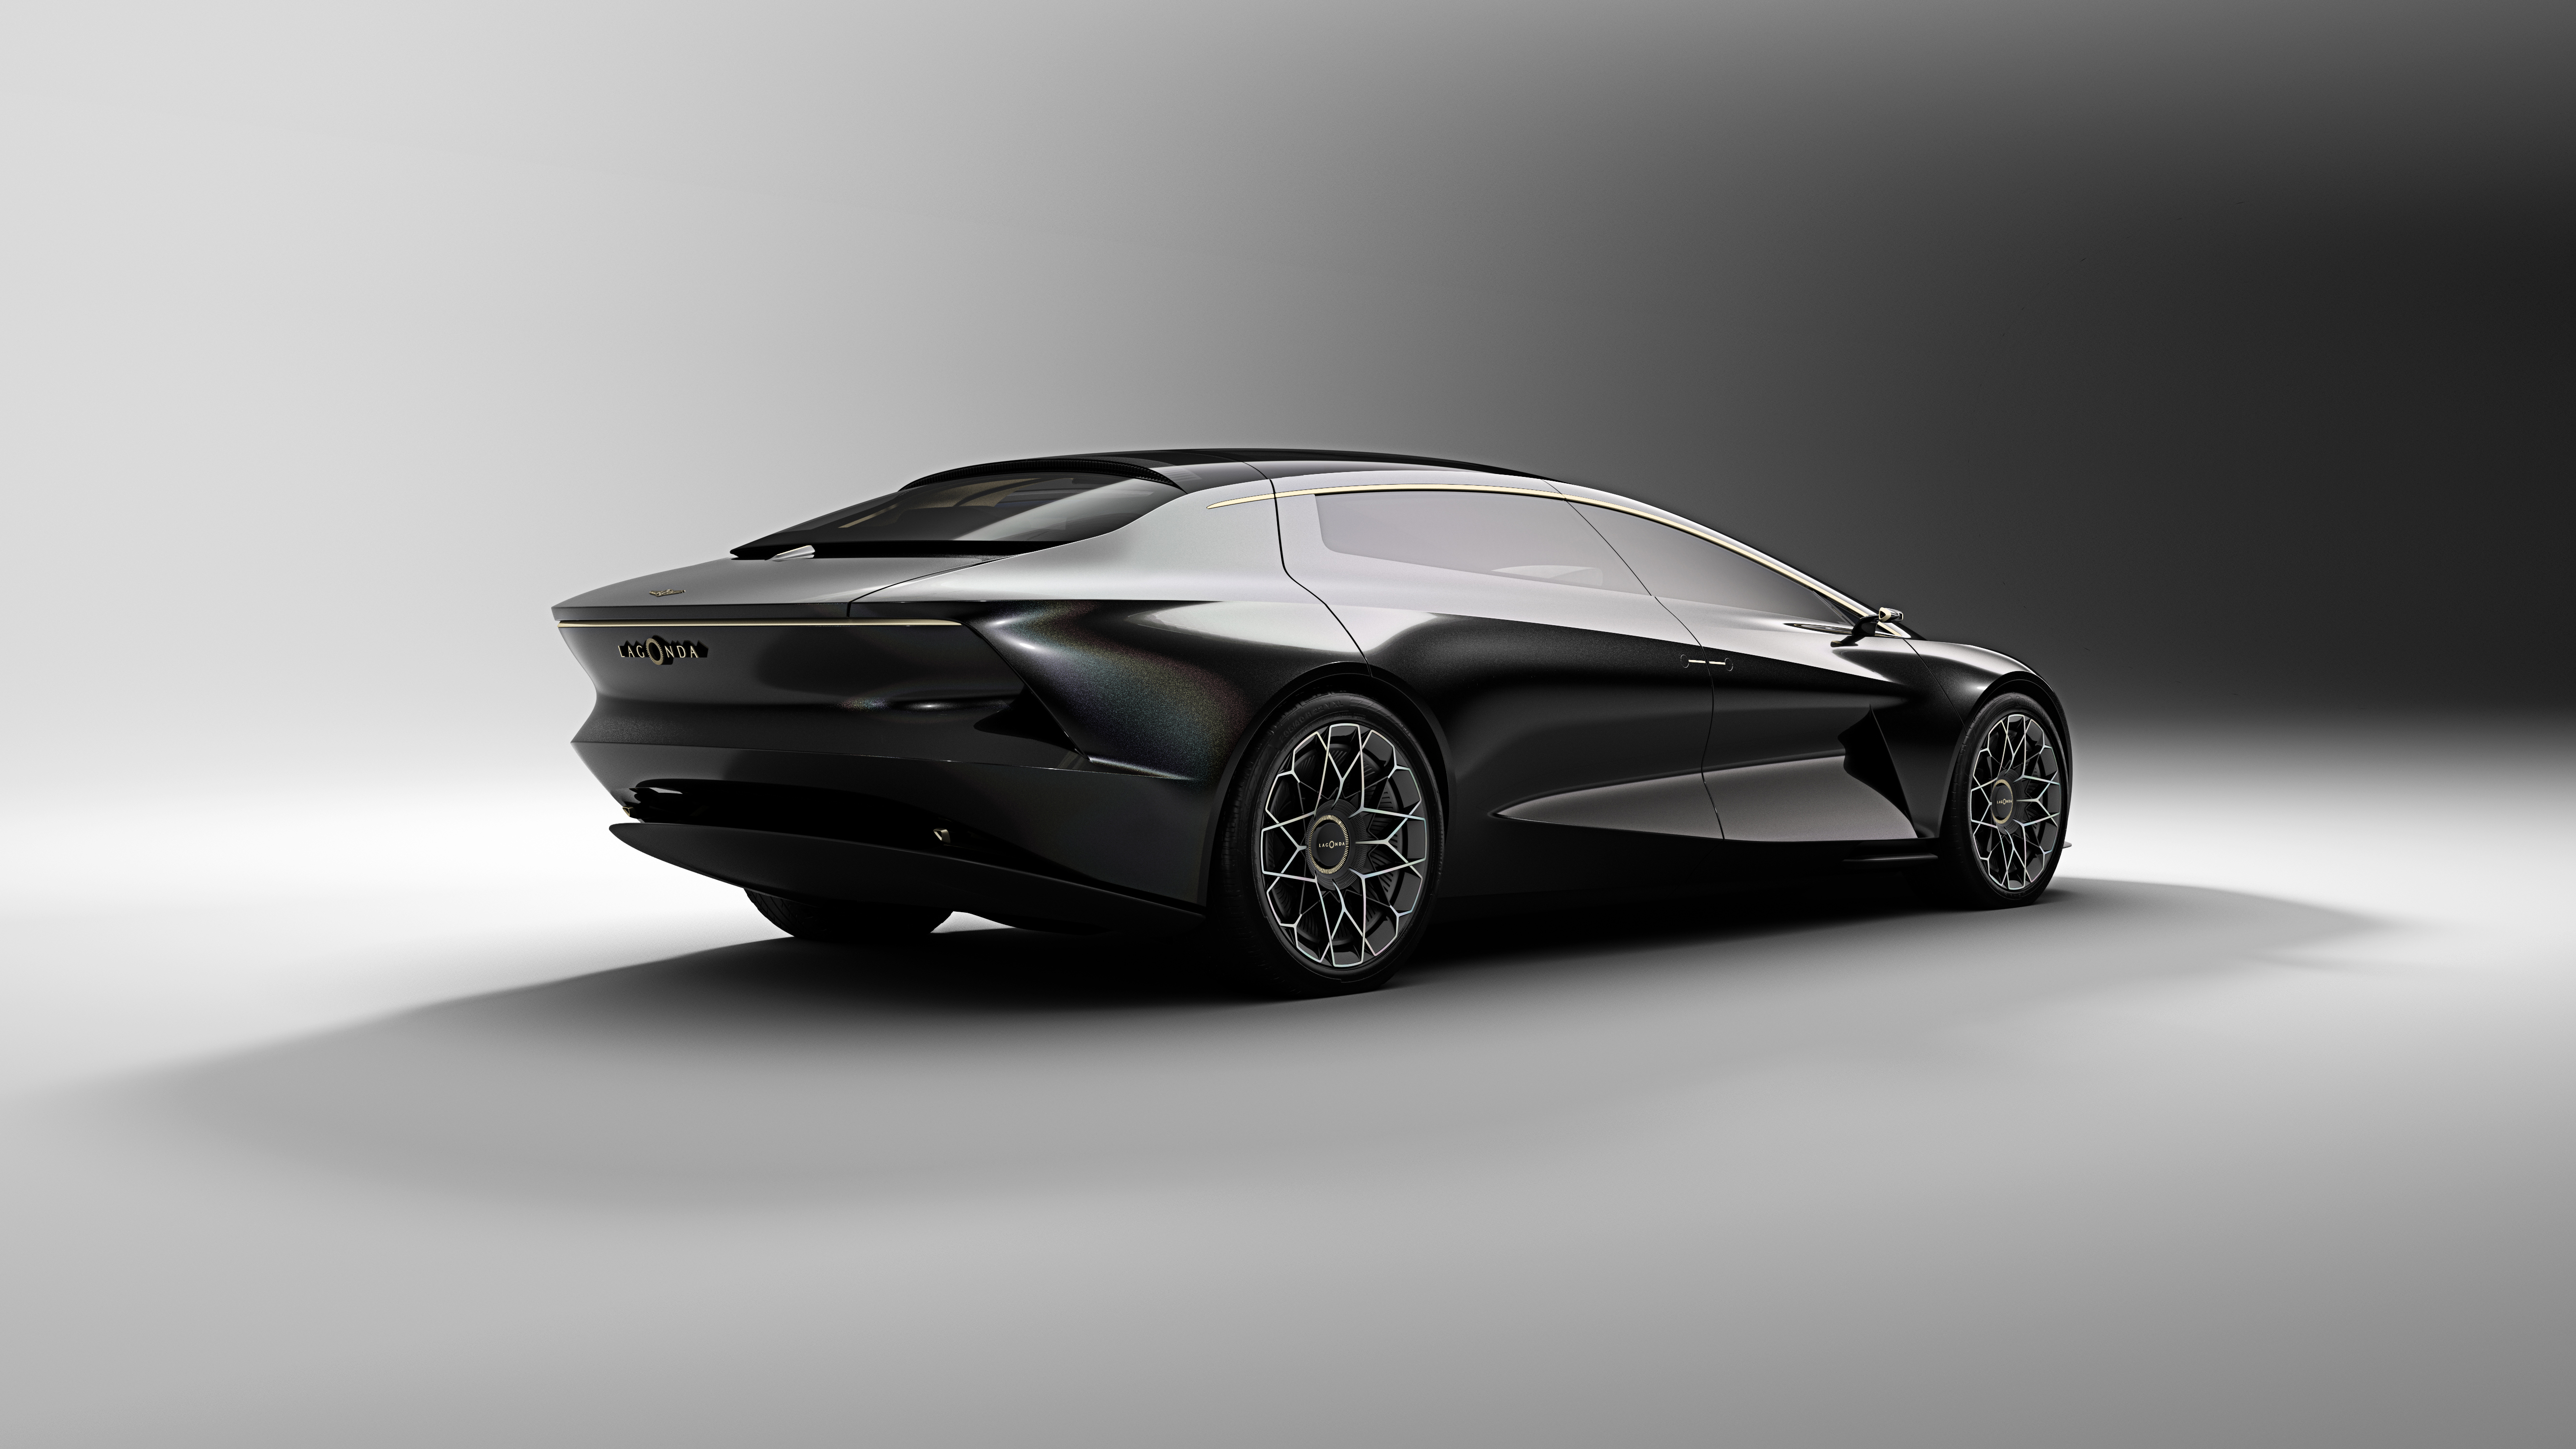 Aston Martin - Aston Martin - Lagonda Vision Concept